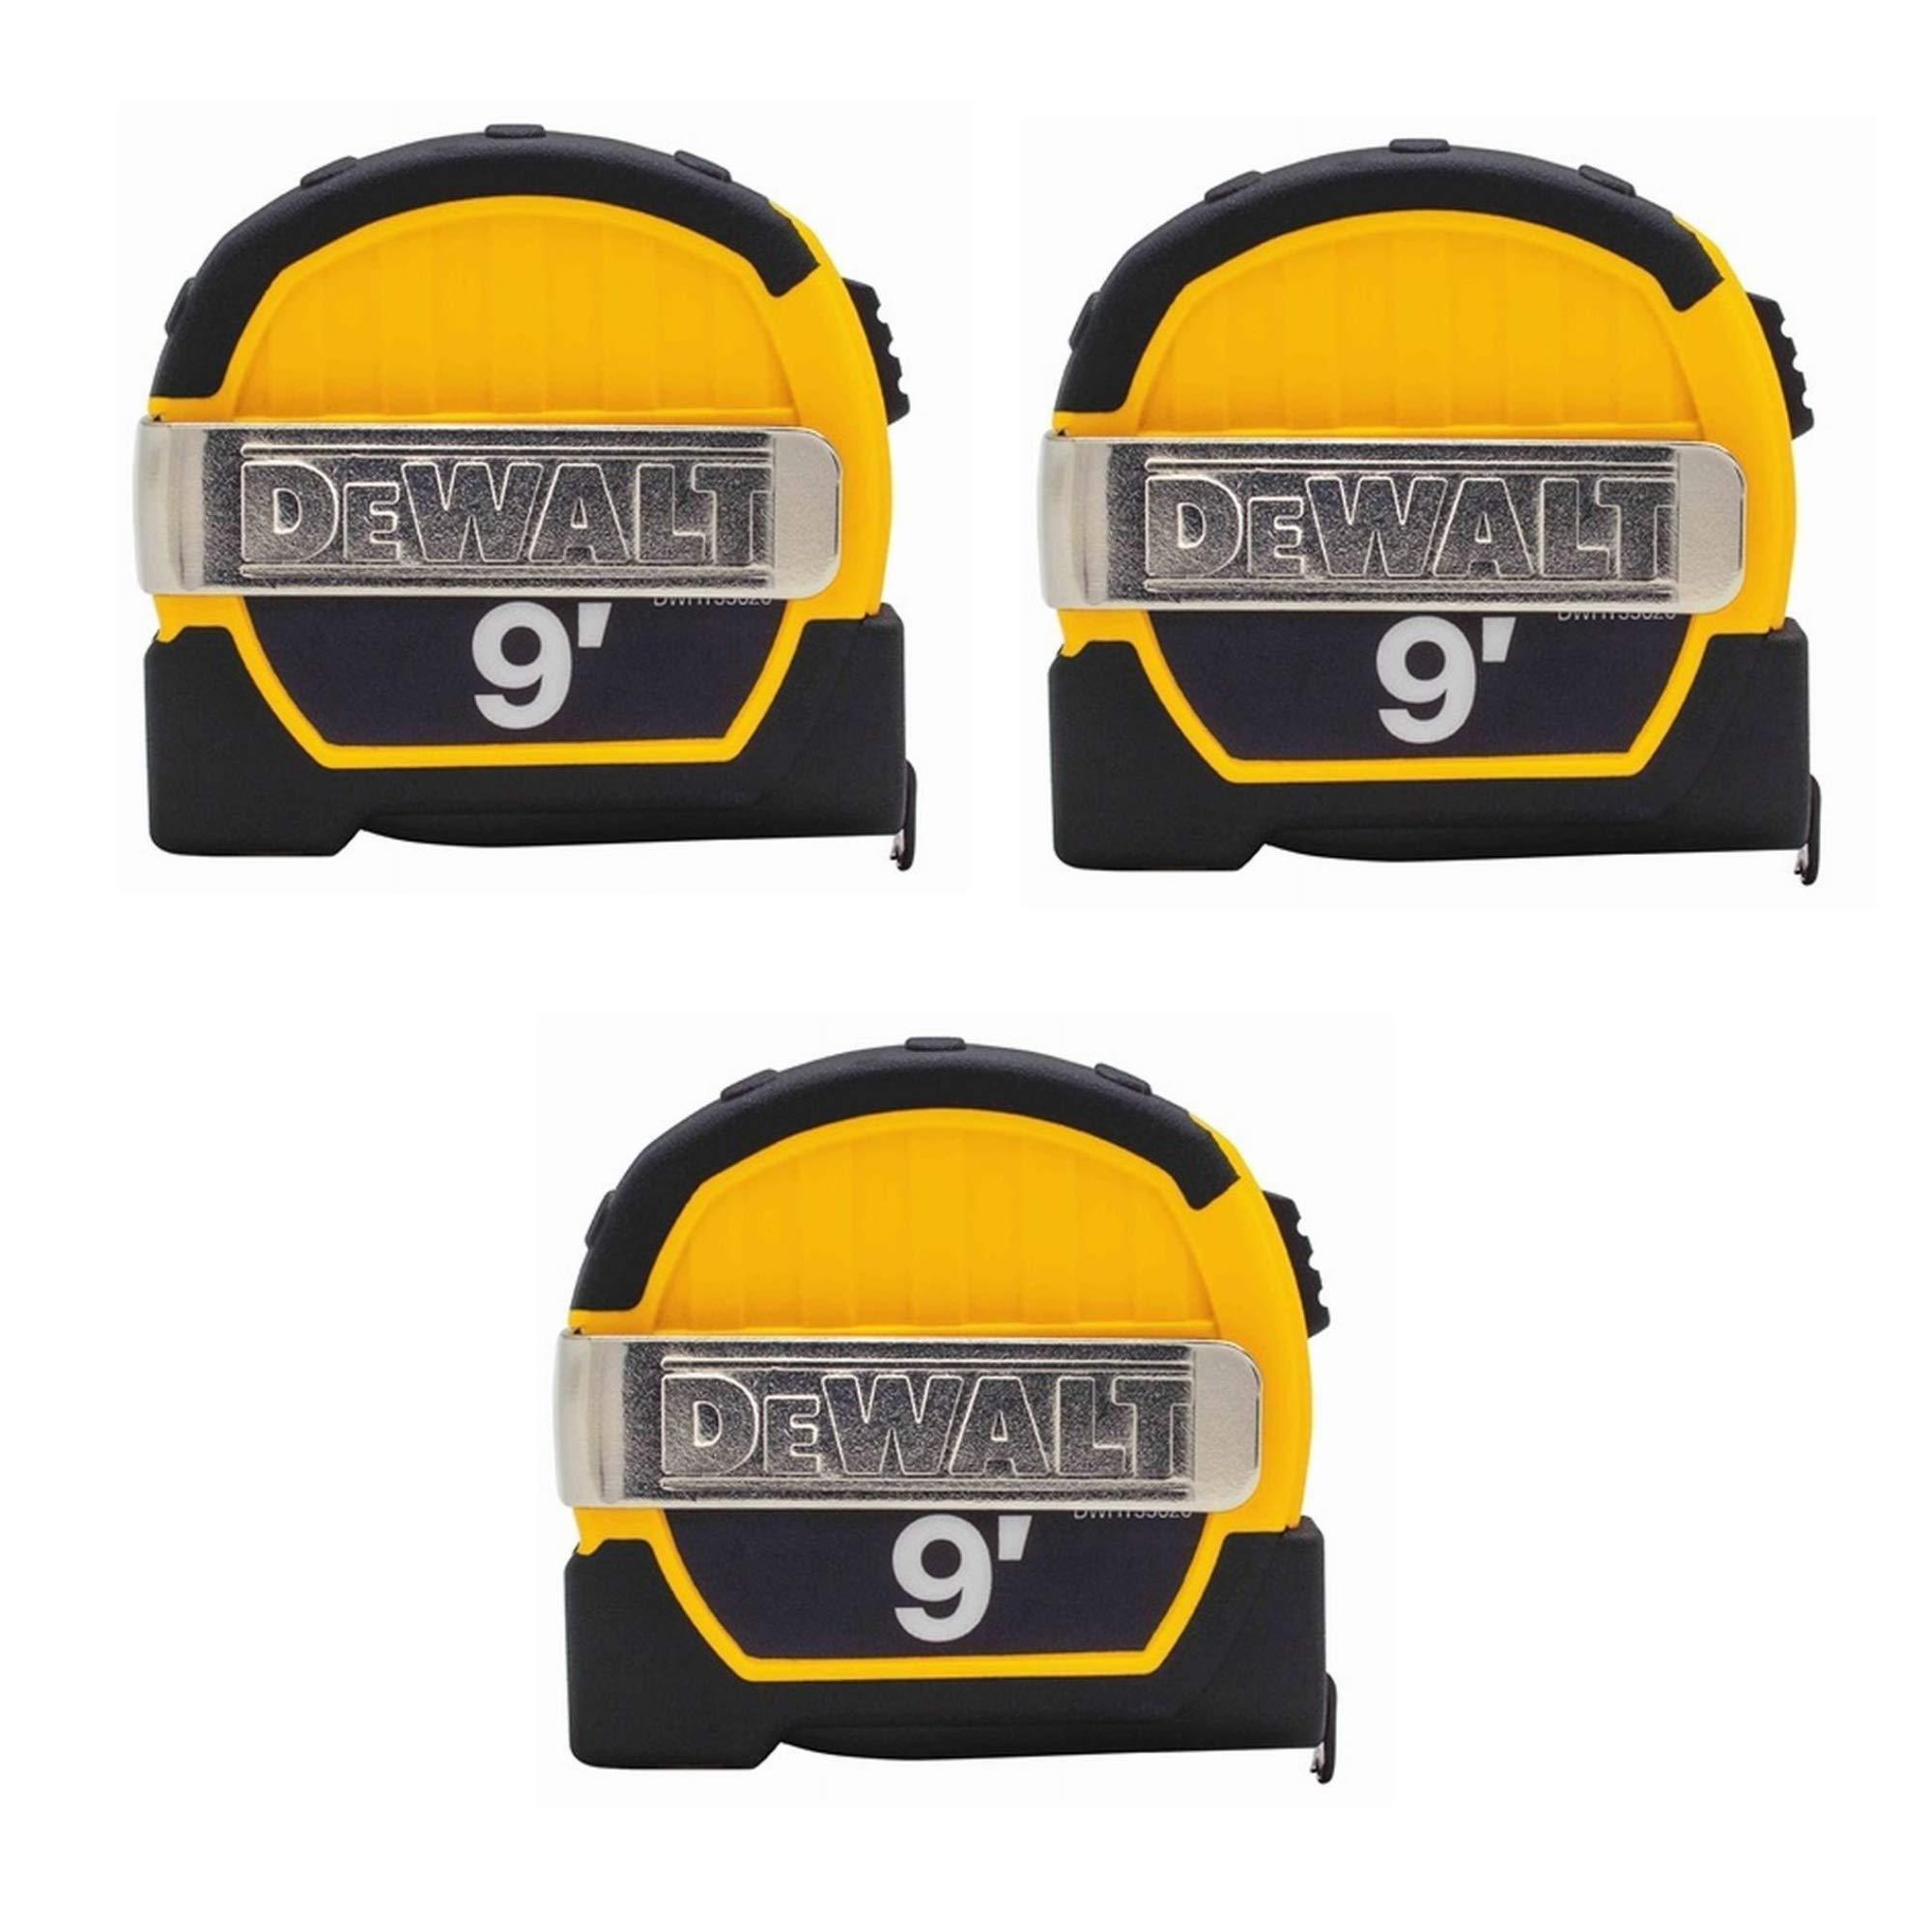 Dewalt DWHT33028M 9ft. Magnetic Pocket Tape Measure, Black and Yellow, 3 Pack by DEWALT